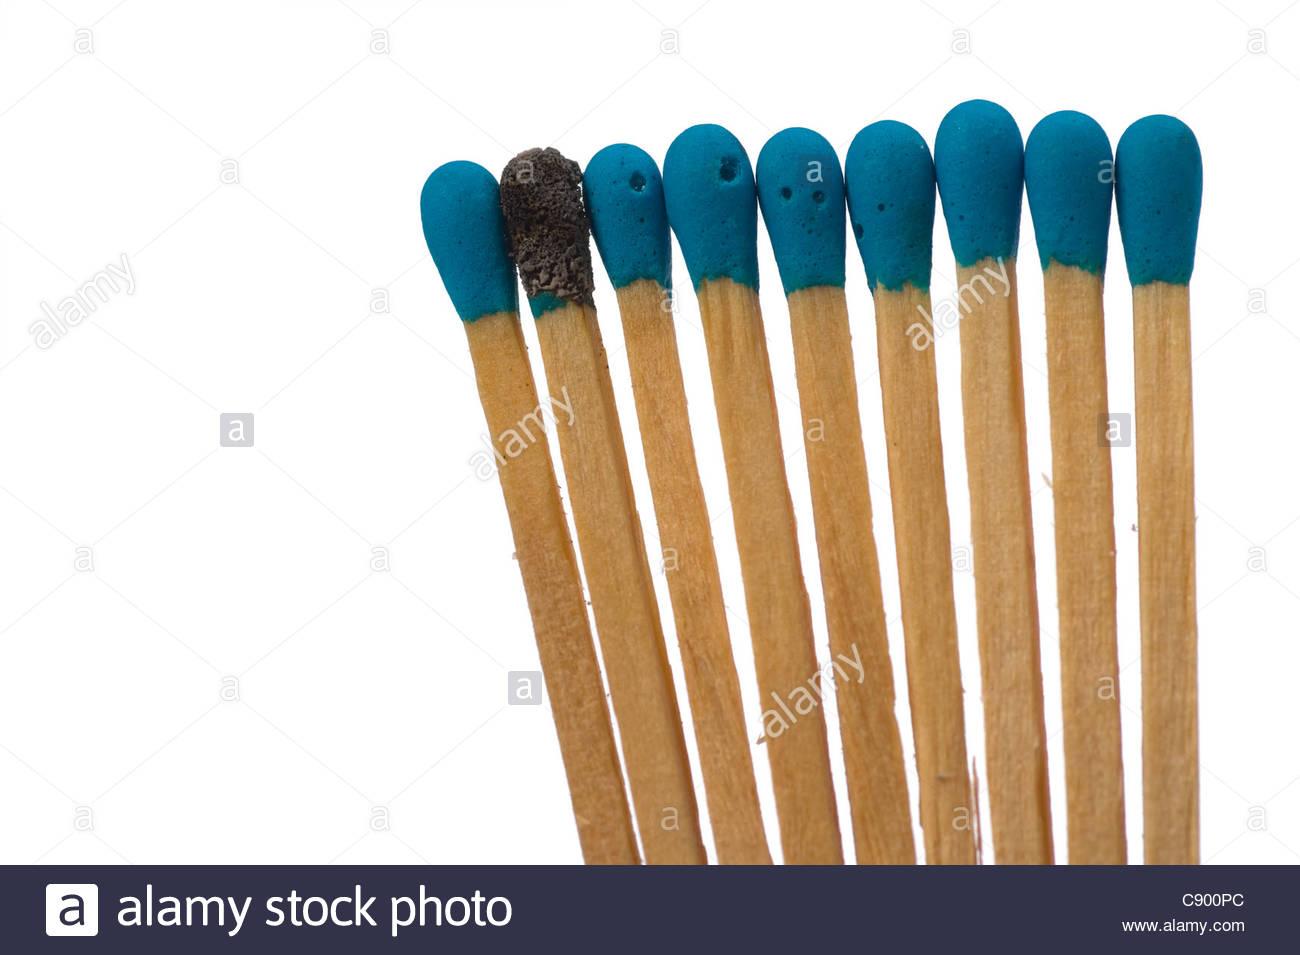 Close up shot of matches isolated on white - Stock Image